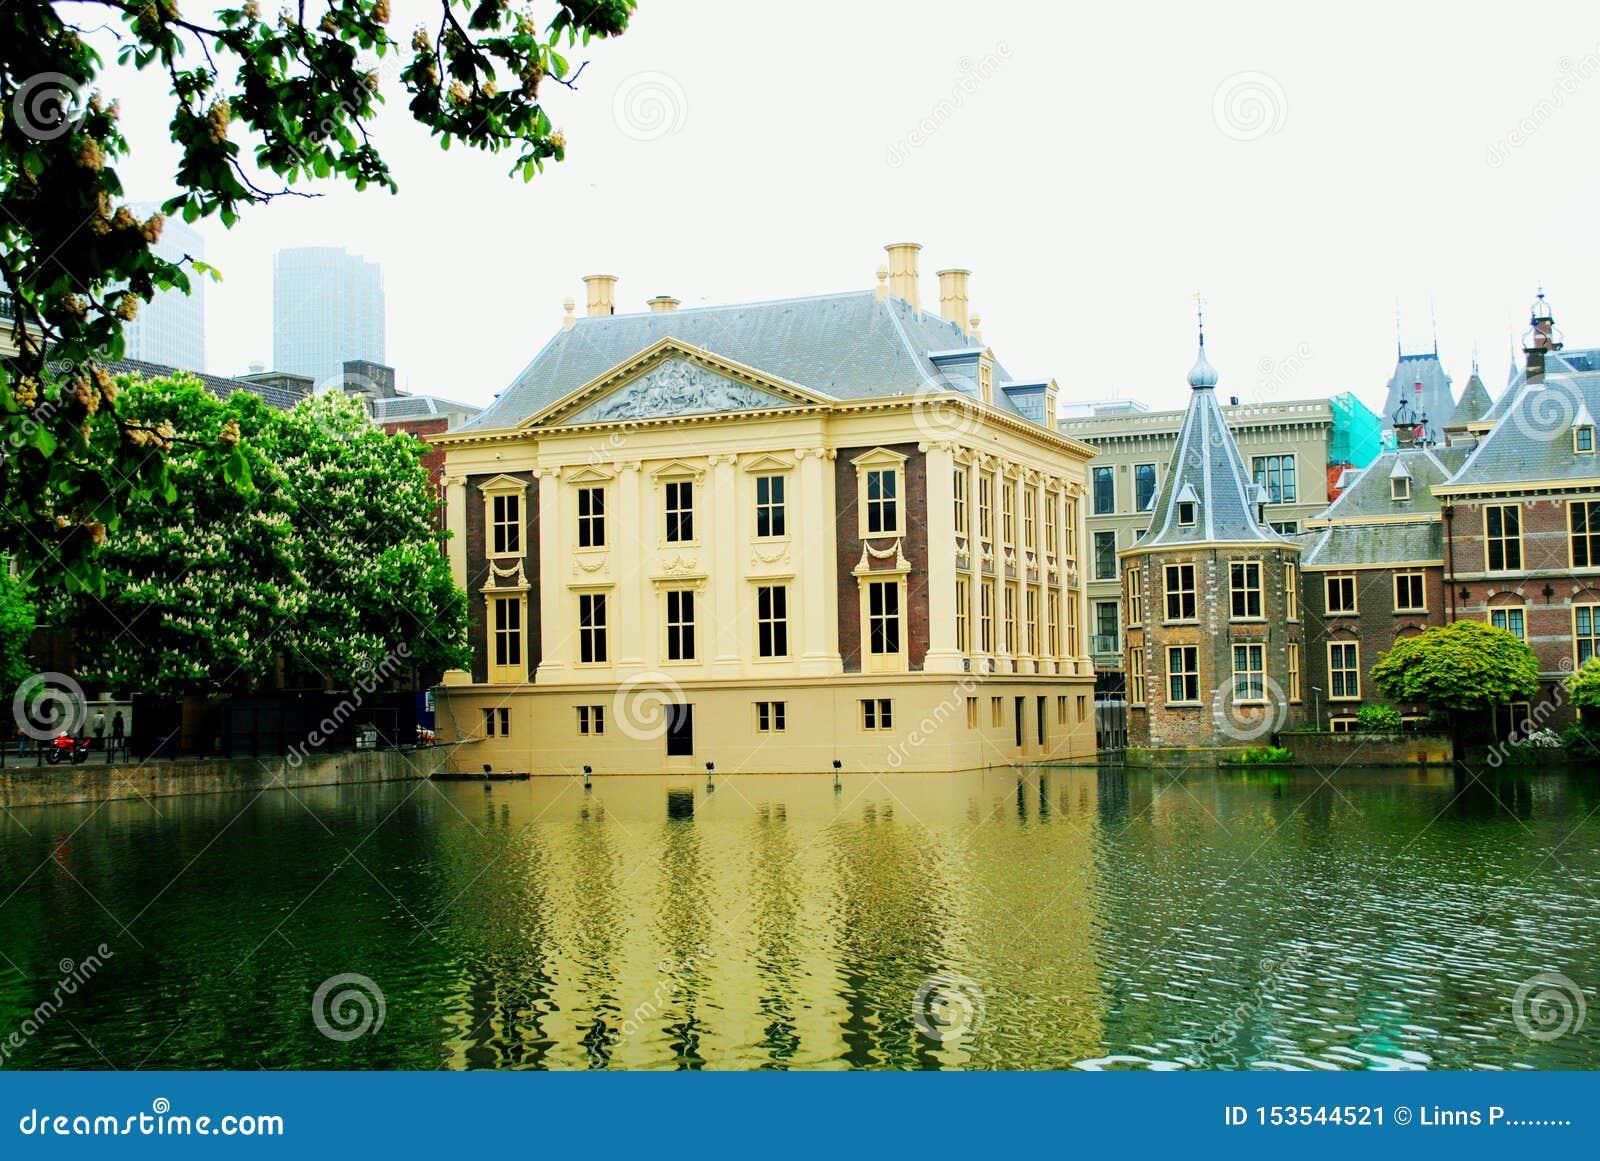 As casas em Haia Países Baixos, refletiram na lagoa Europa